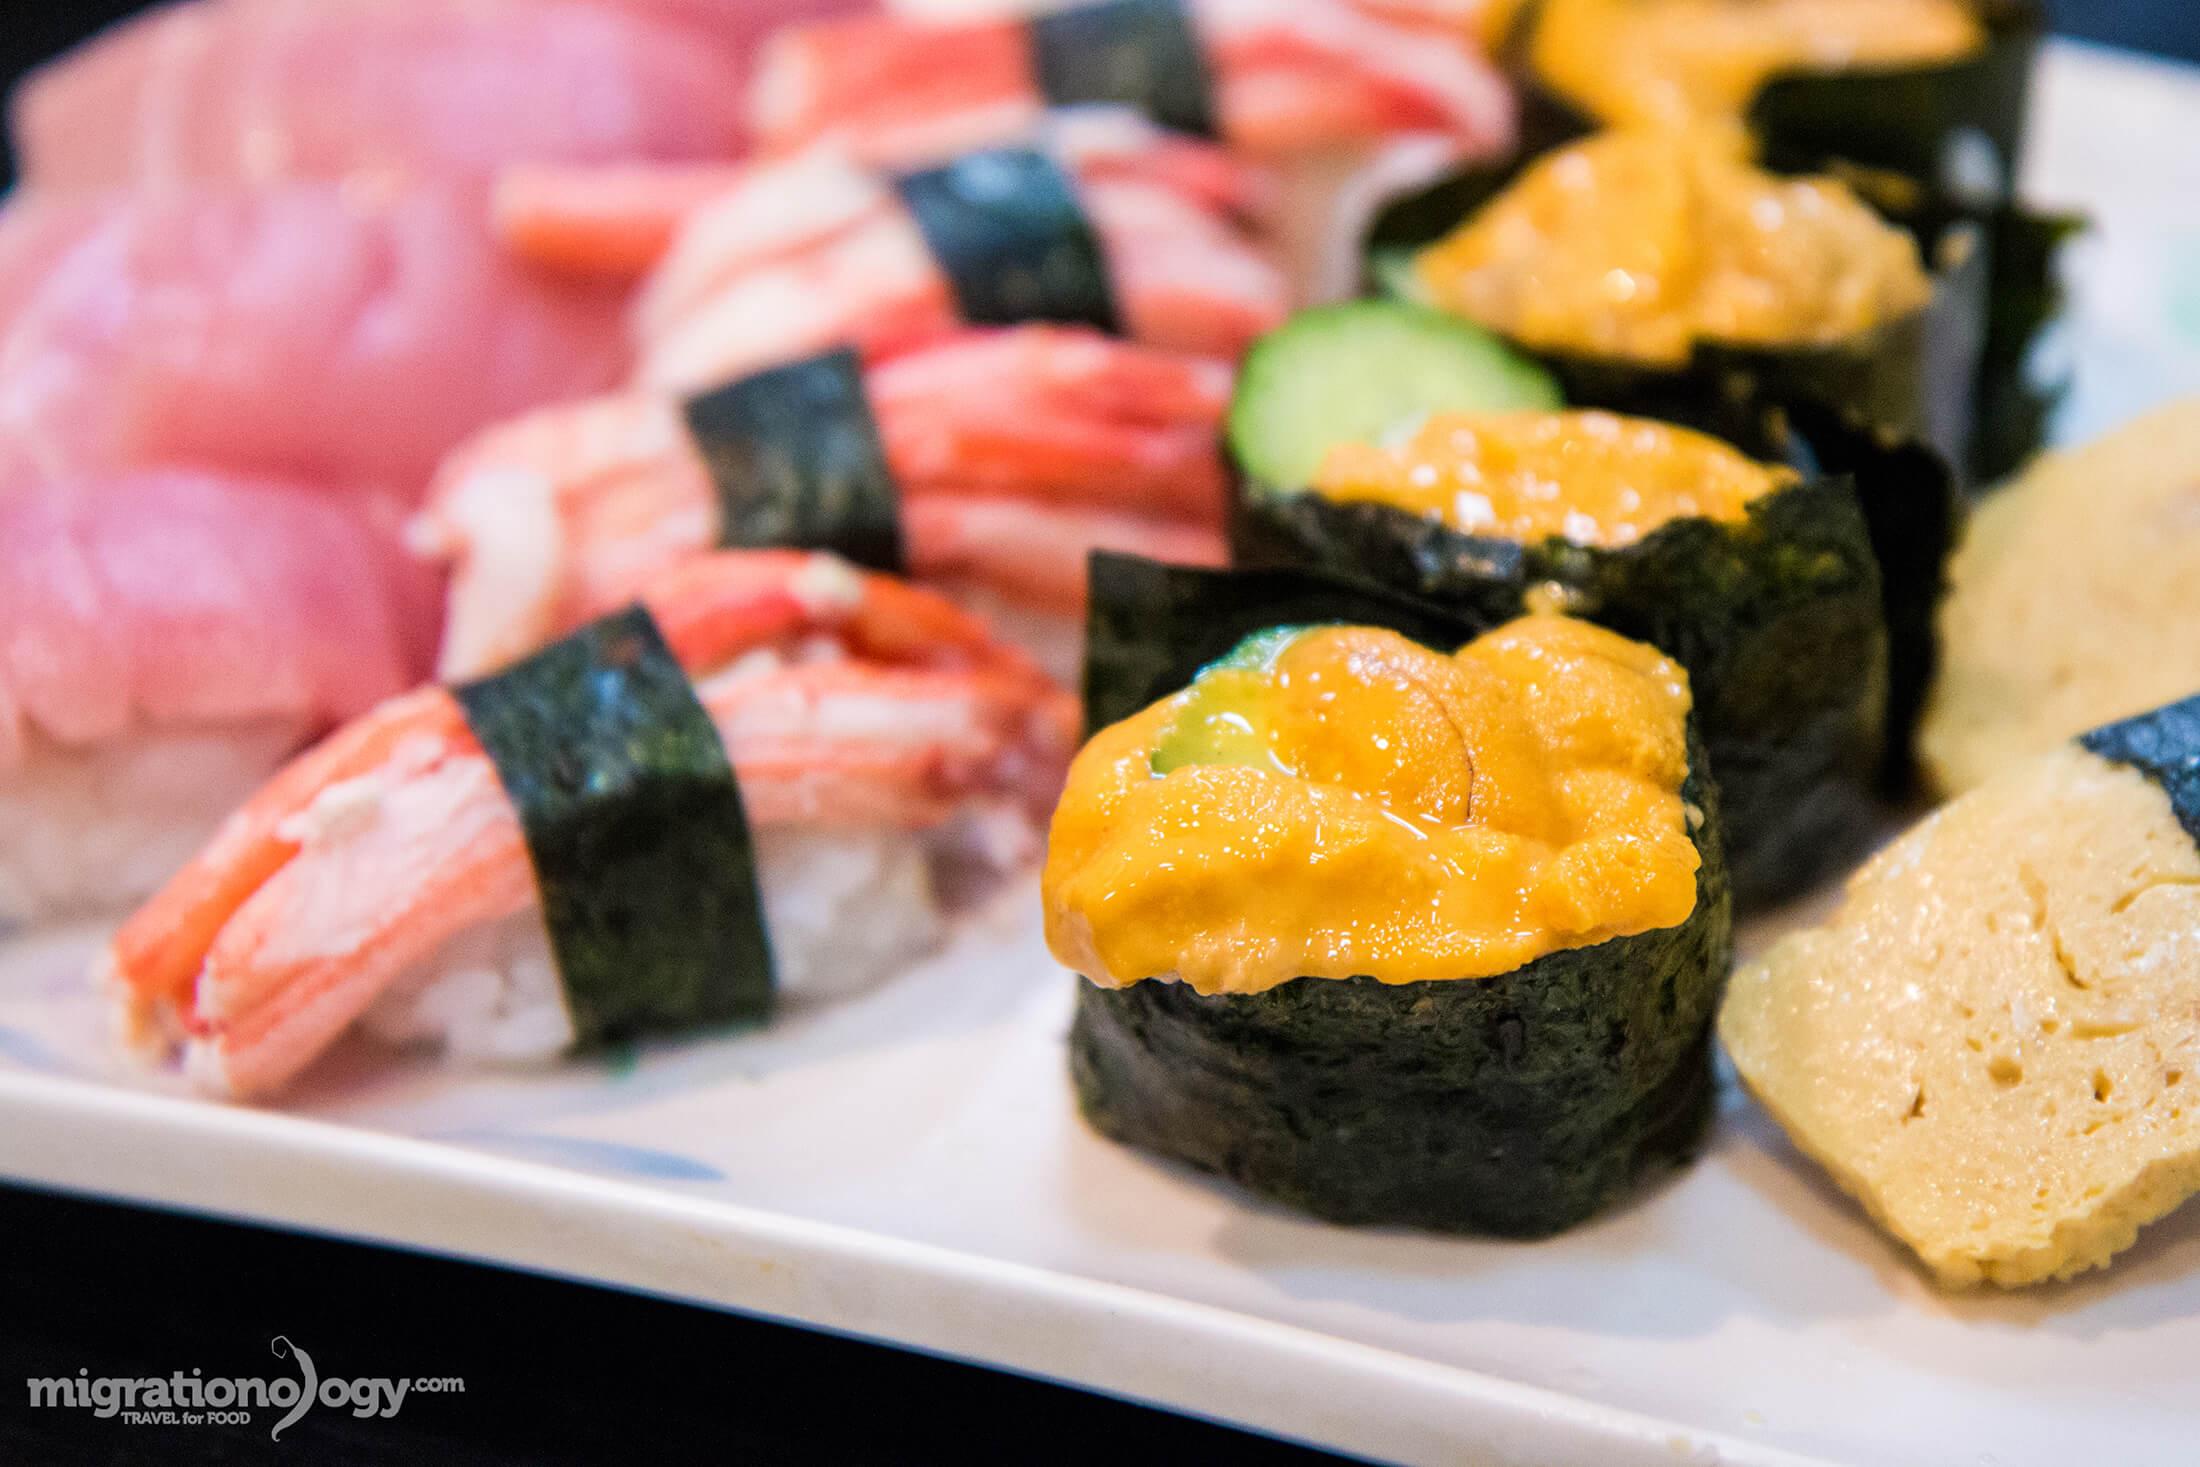 Famous Sushi Restaurant In Japan